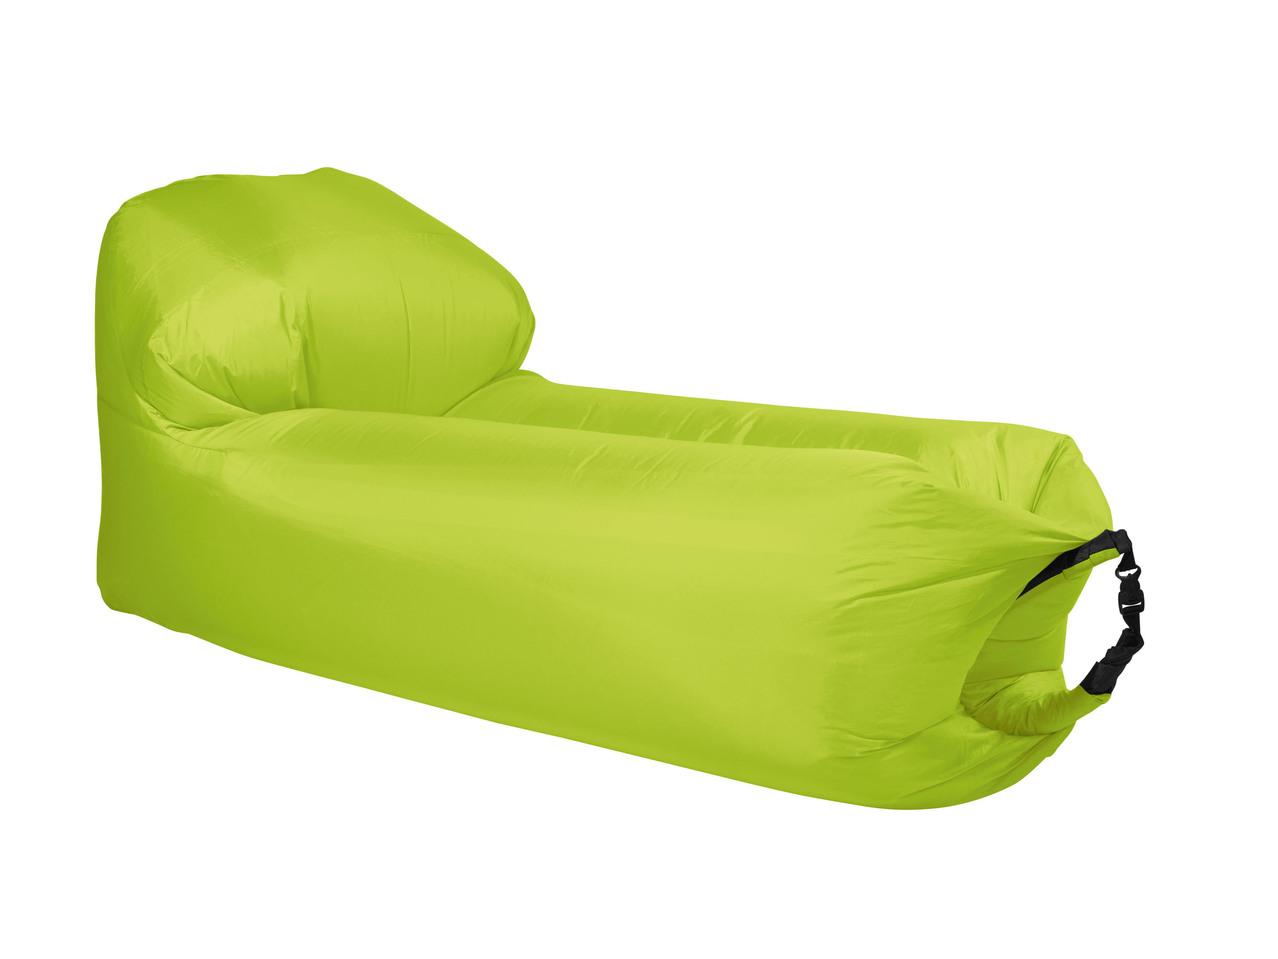 Lidl air lounger